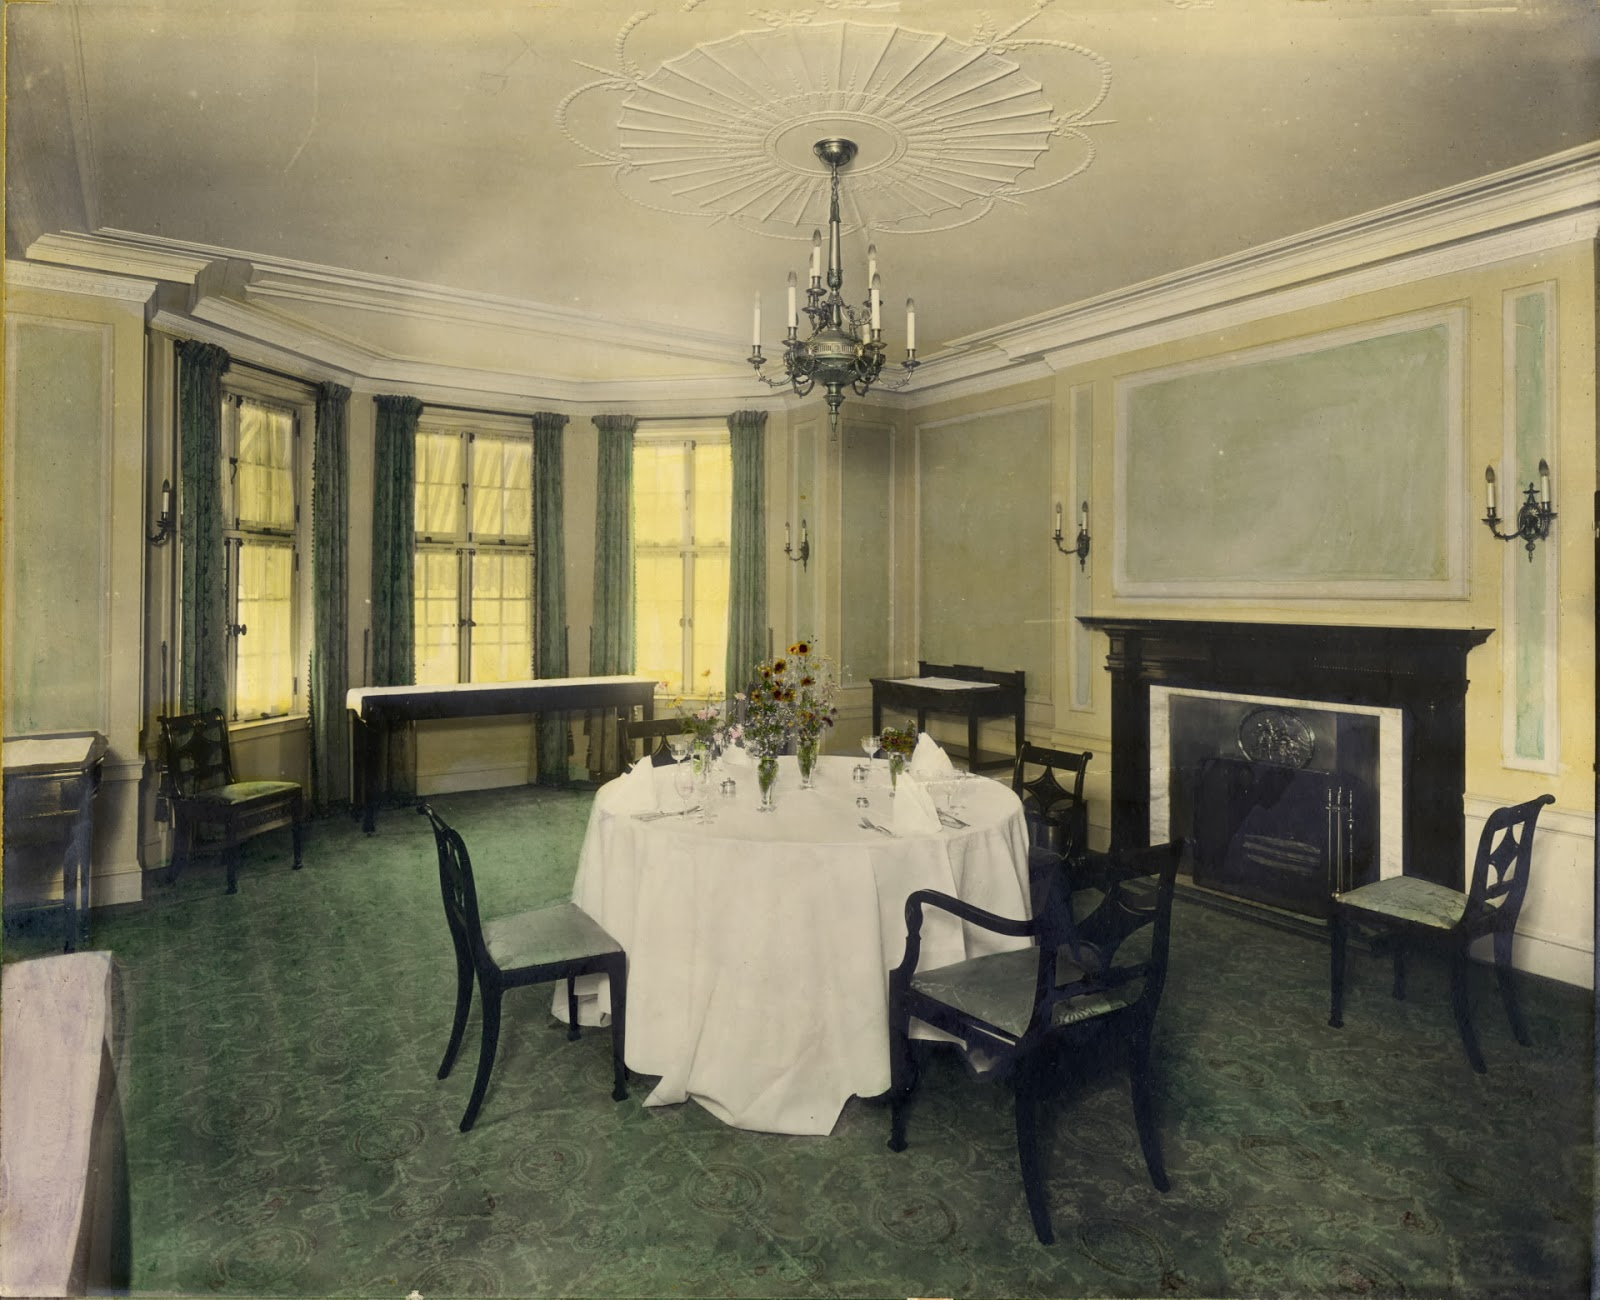 THEN The Breakfast Room